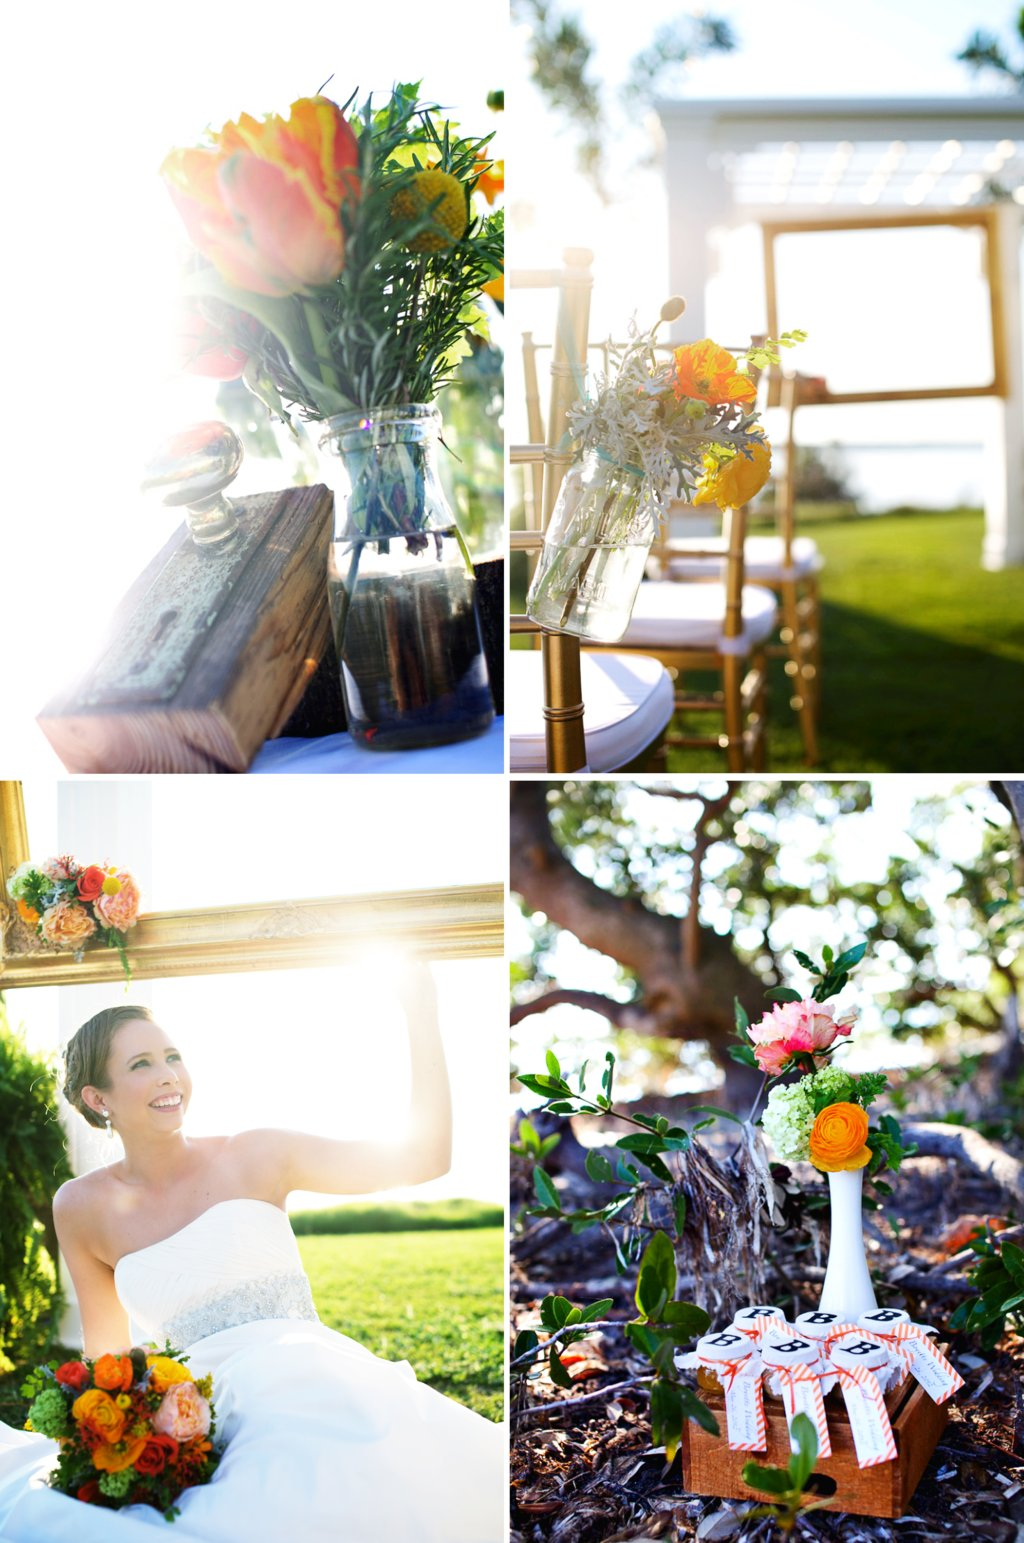 Rustic-citrus-wedding-inspiration-outdoor-wedding-mason-jar-centerpieces.full